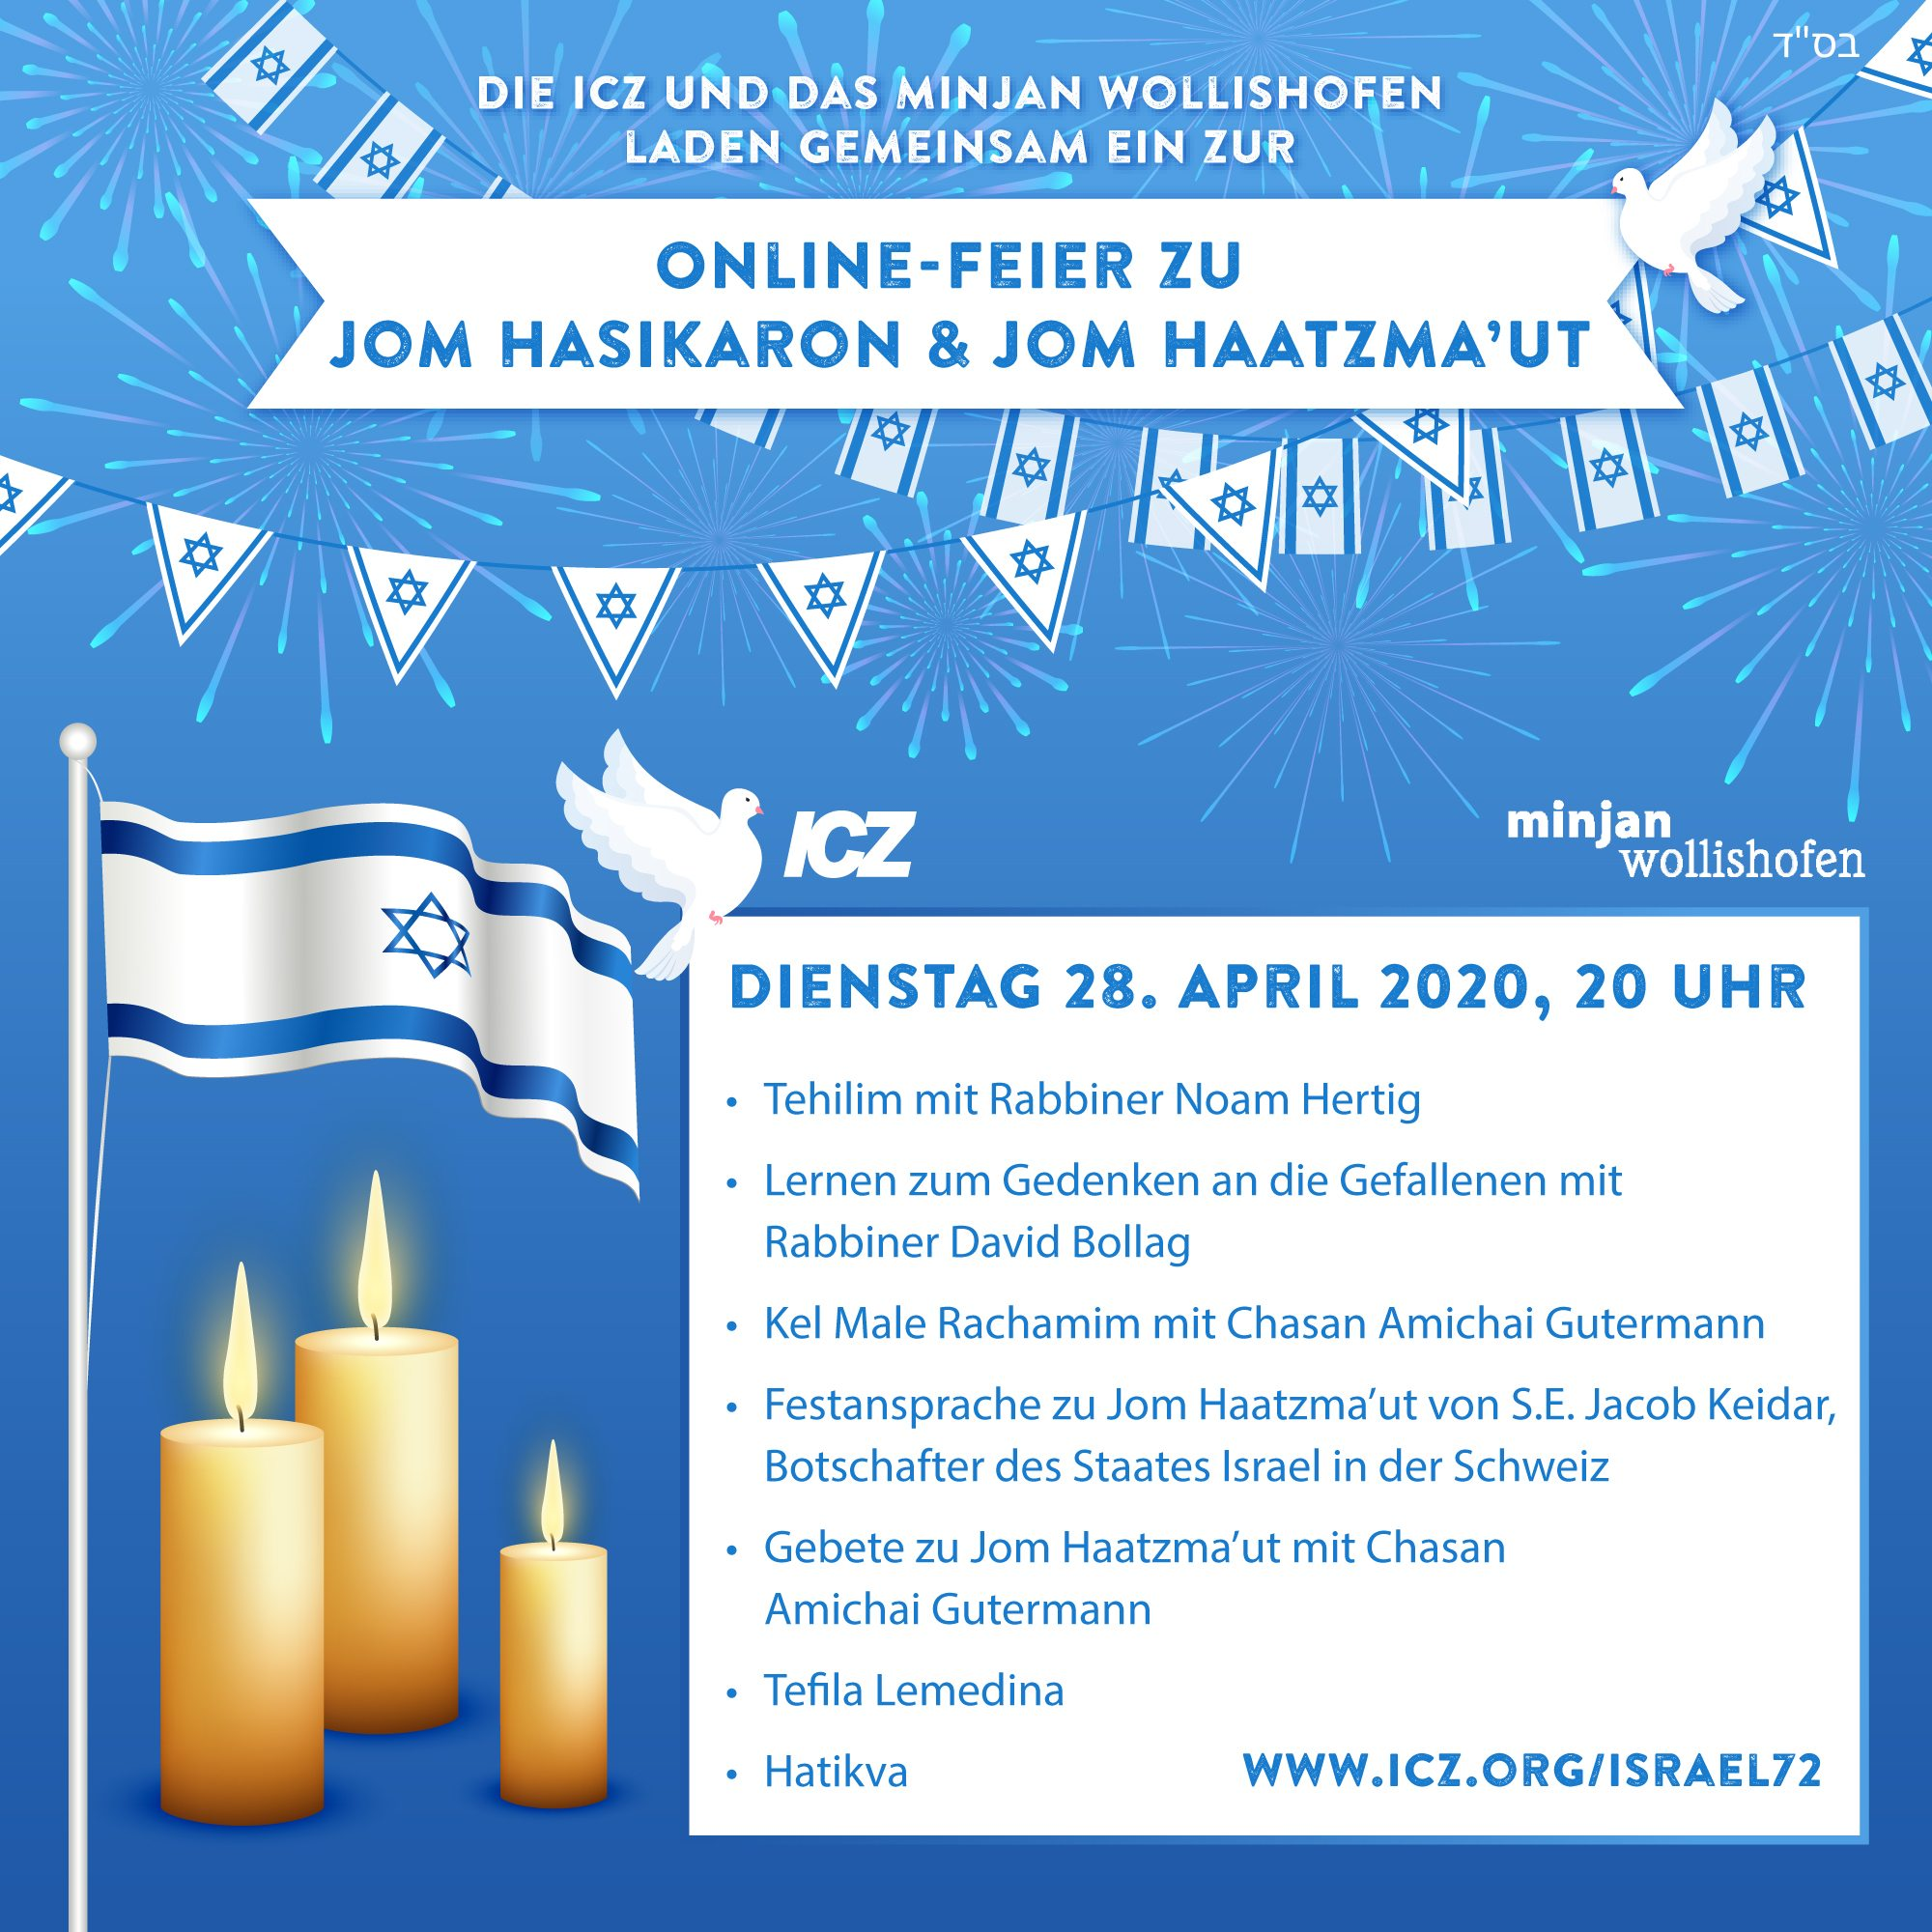 Online-Feier zu Jom Hasikaron und Jom Haatzma'ut